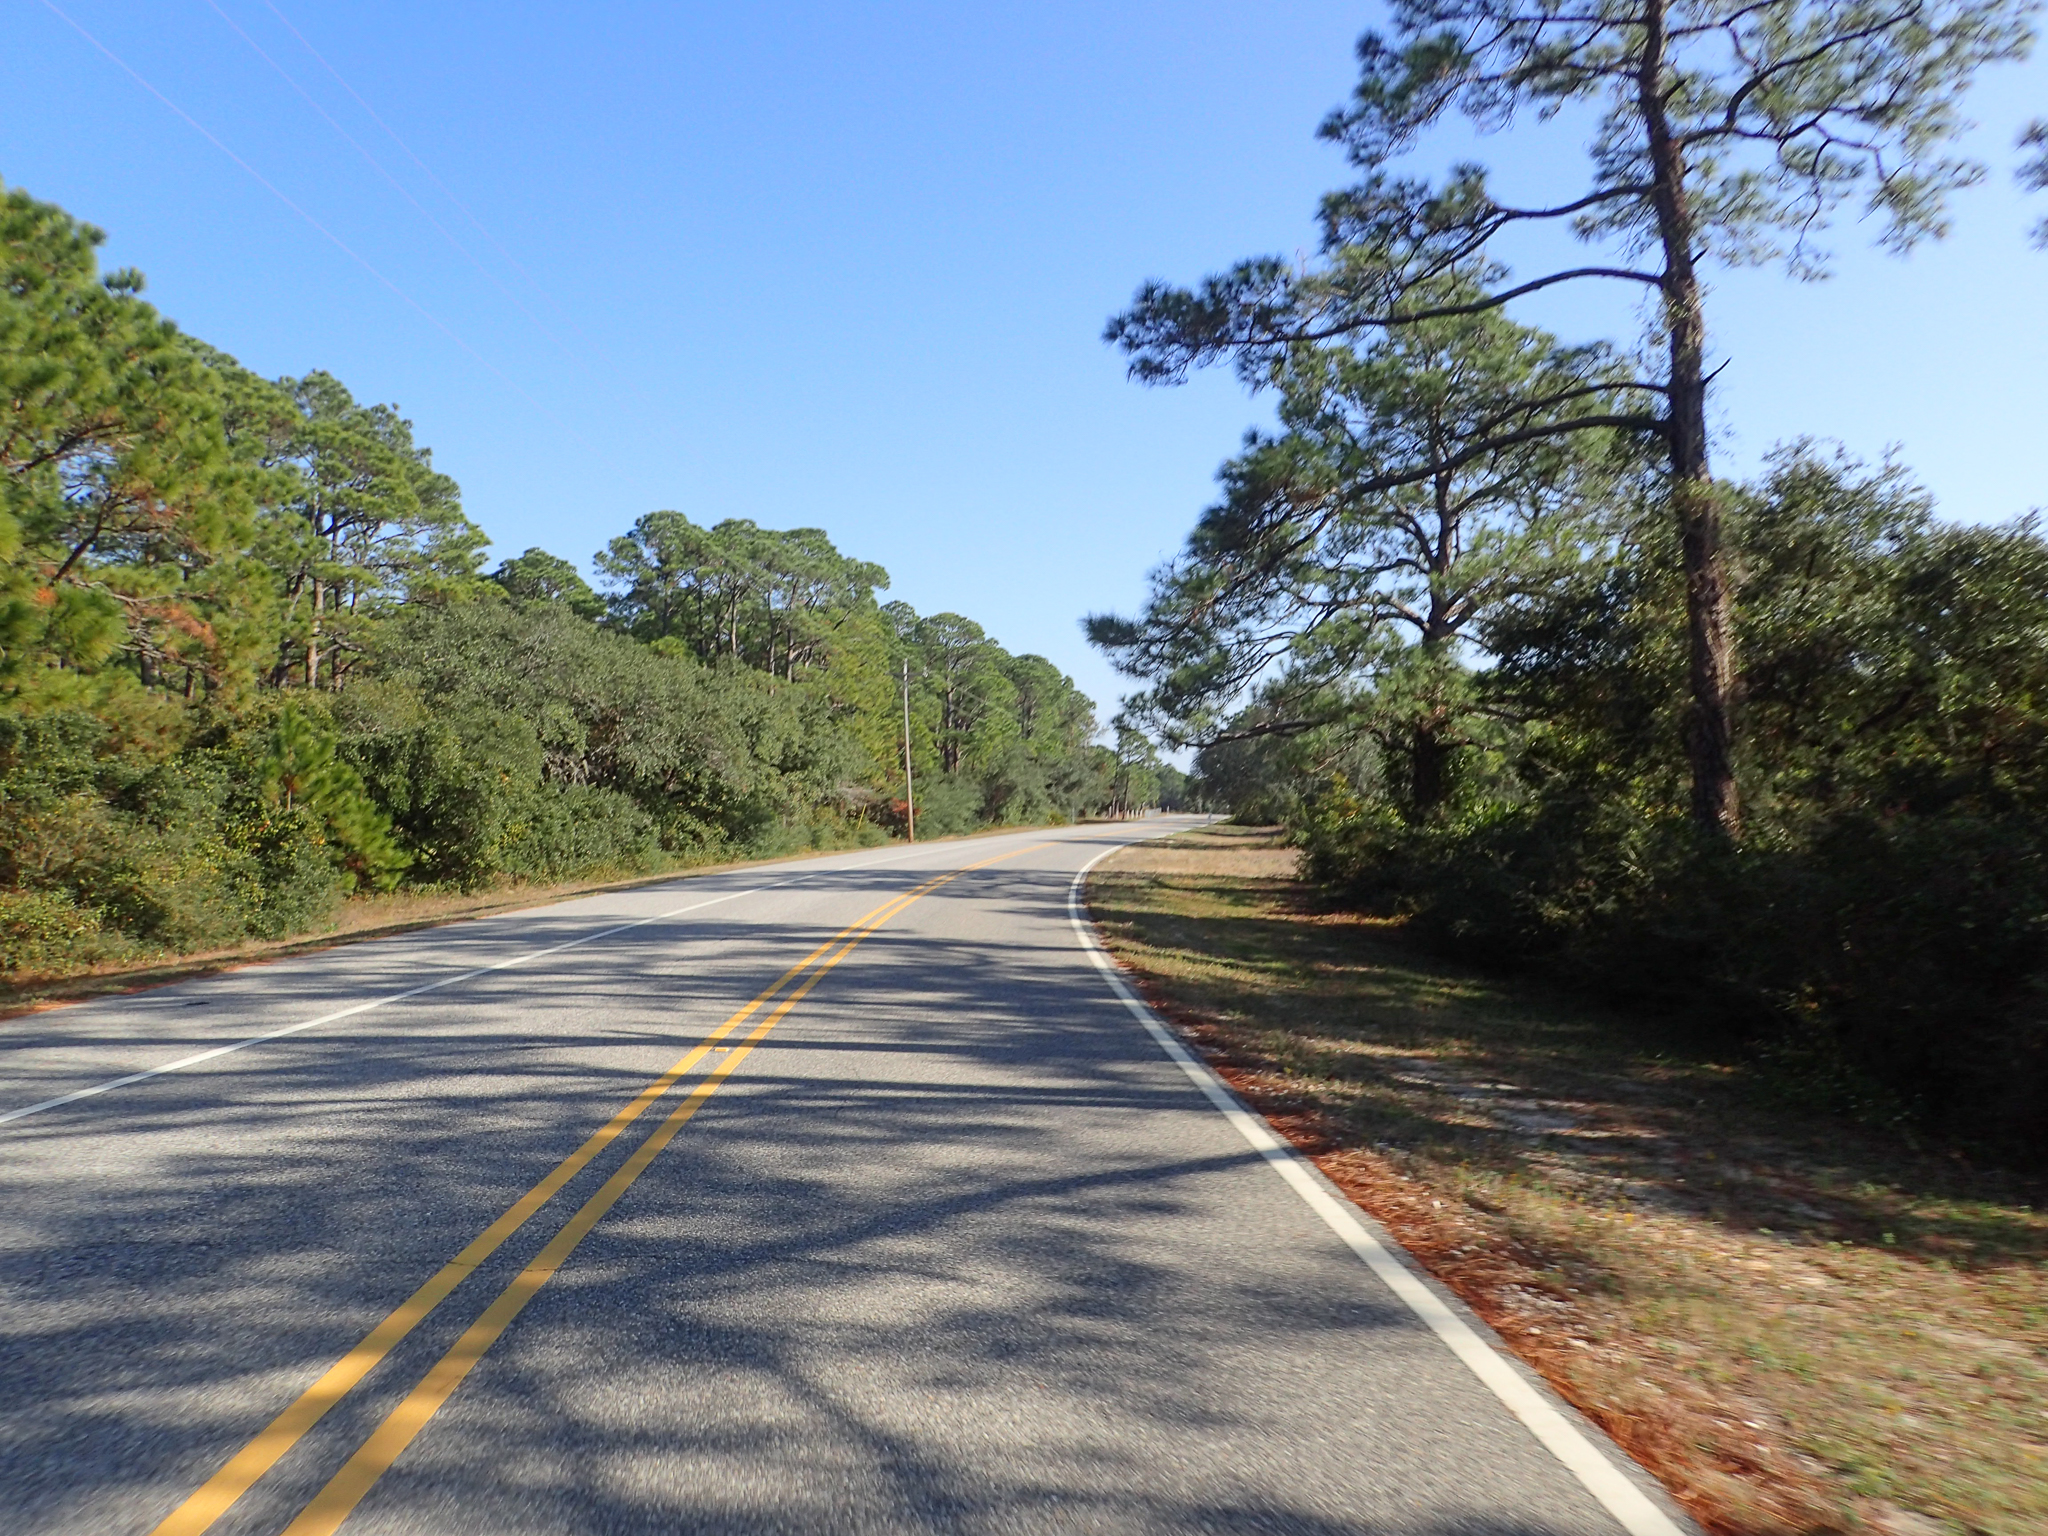 Gulf Shore Road, Alabama